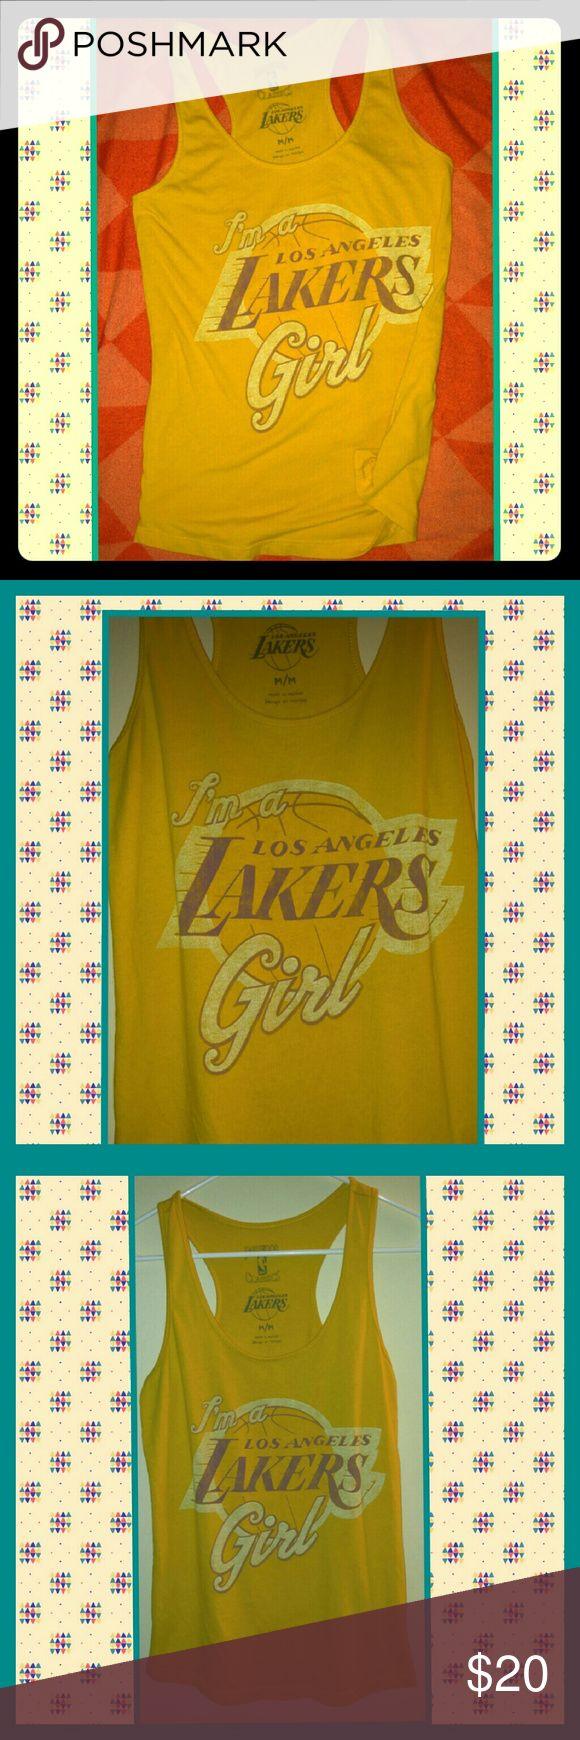 Lakers girl tank medium Worn a few times retro Lakers girl tank racerback style. hardwood classics nba Tops Tank Tops